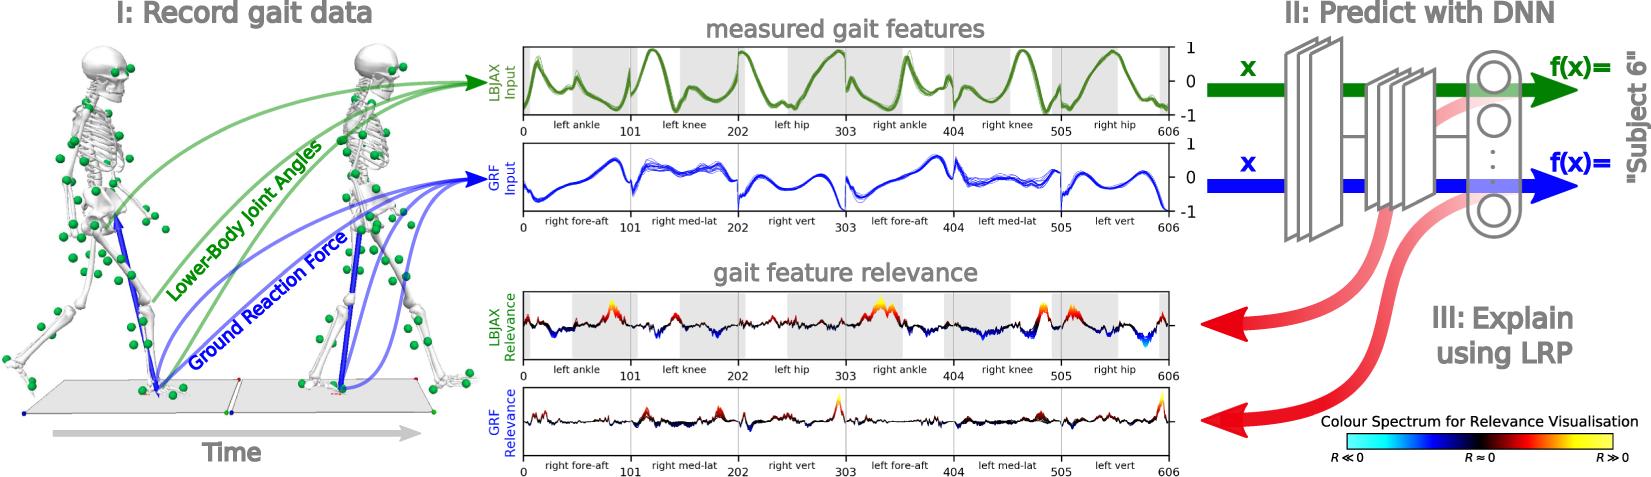 Explaining the unique nature of individual gait patterns